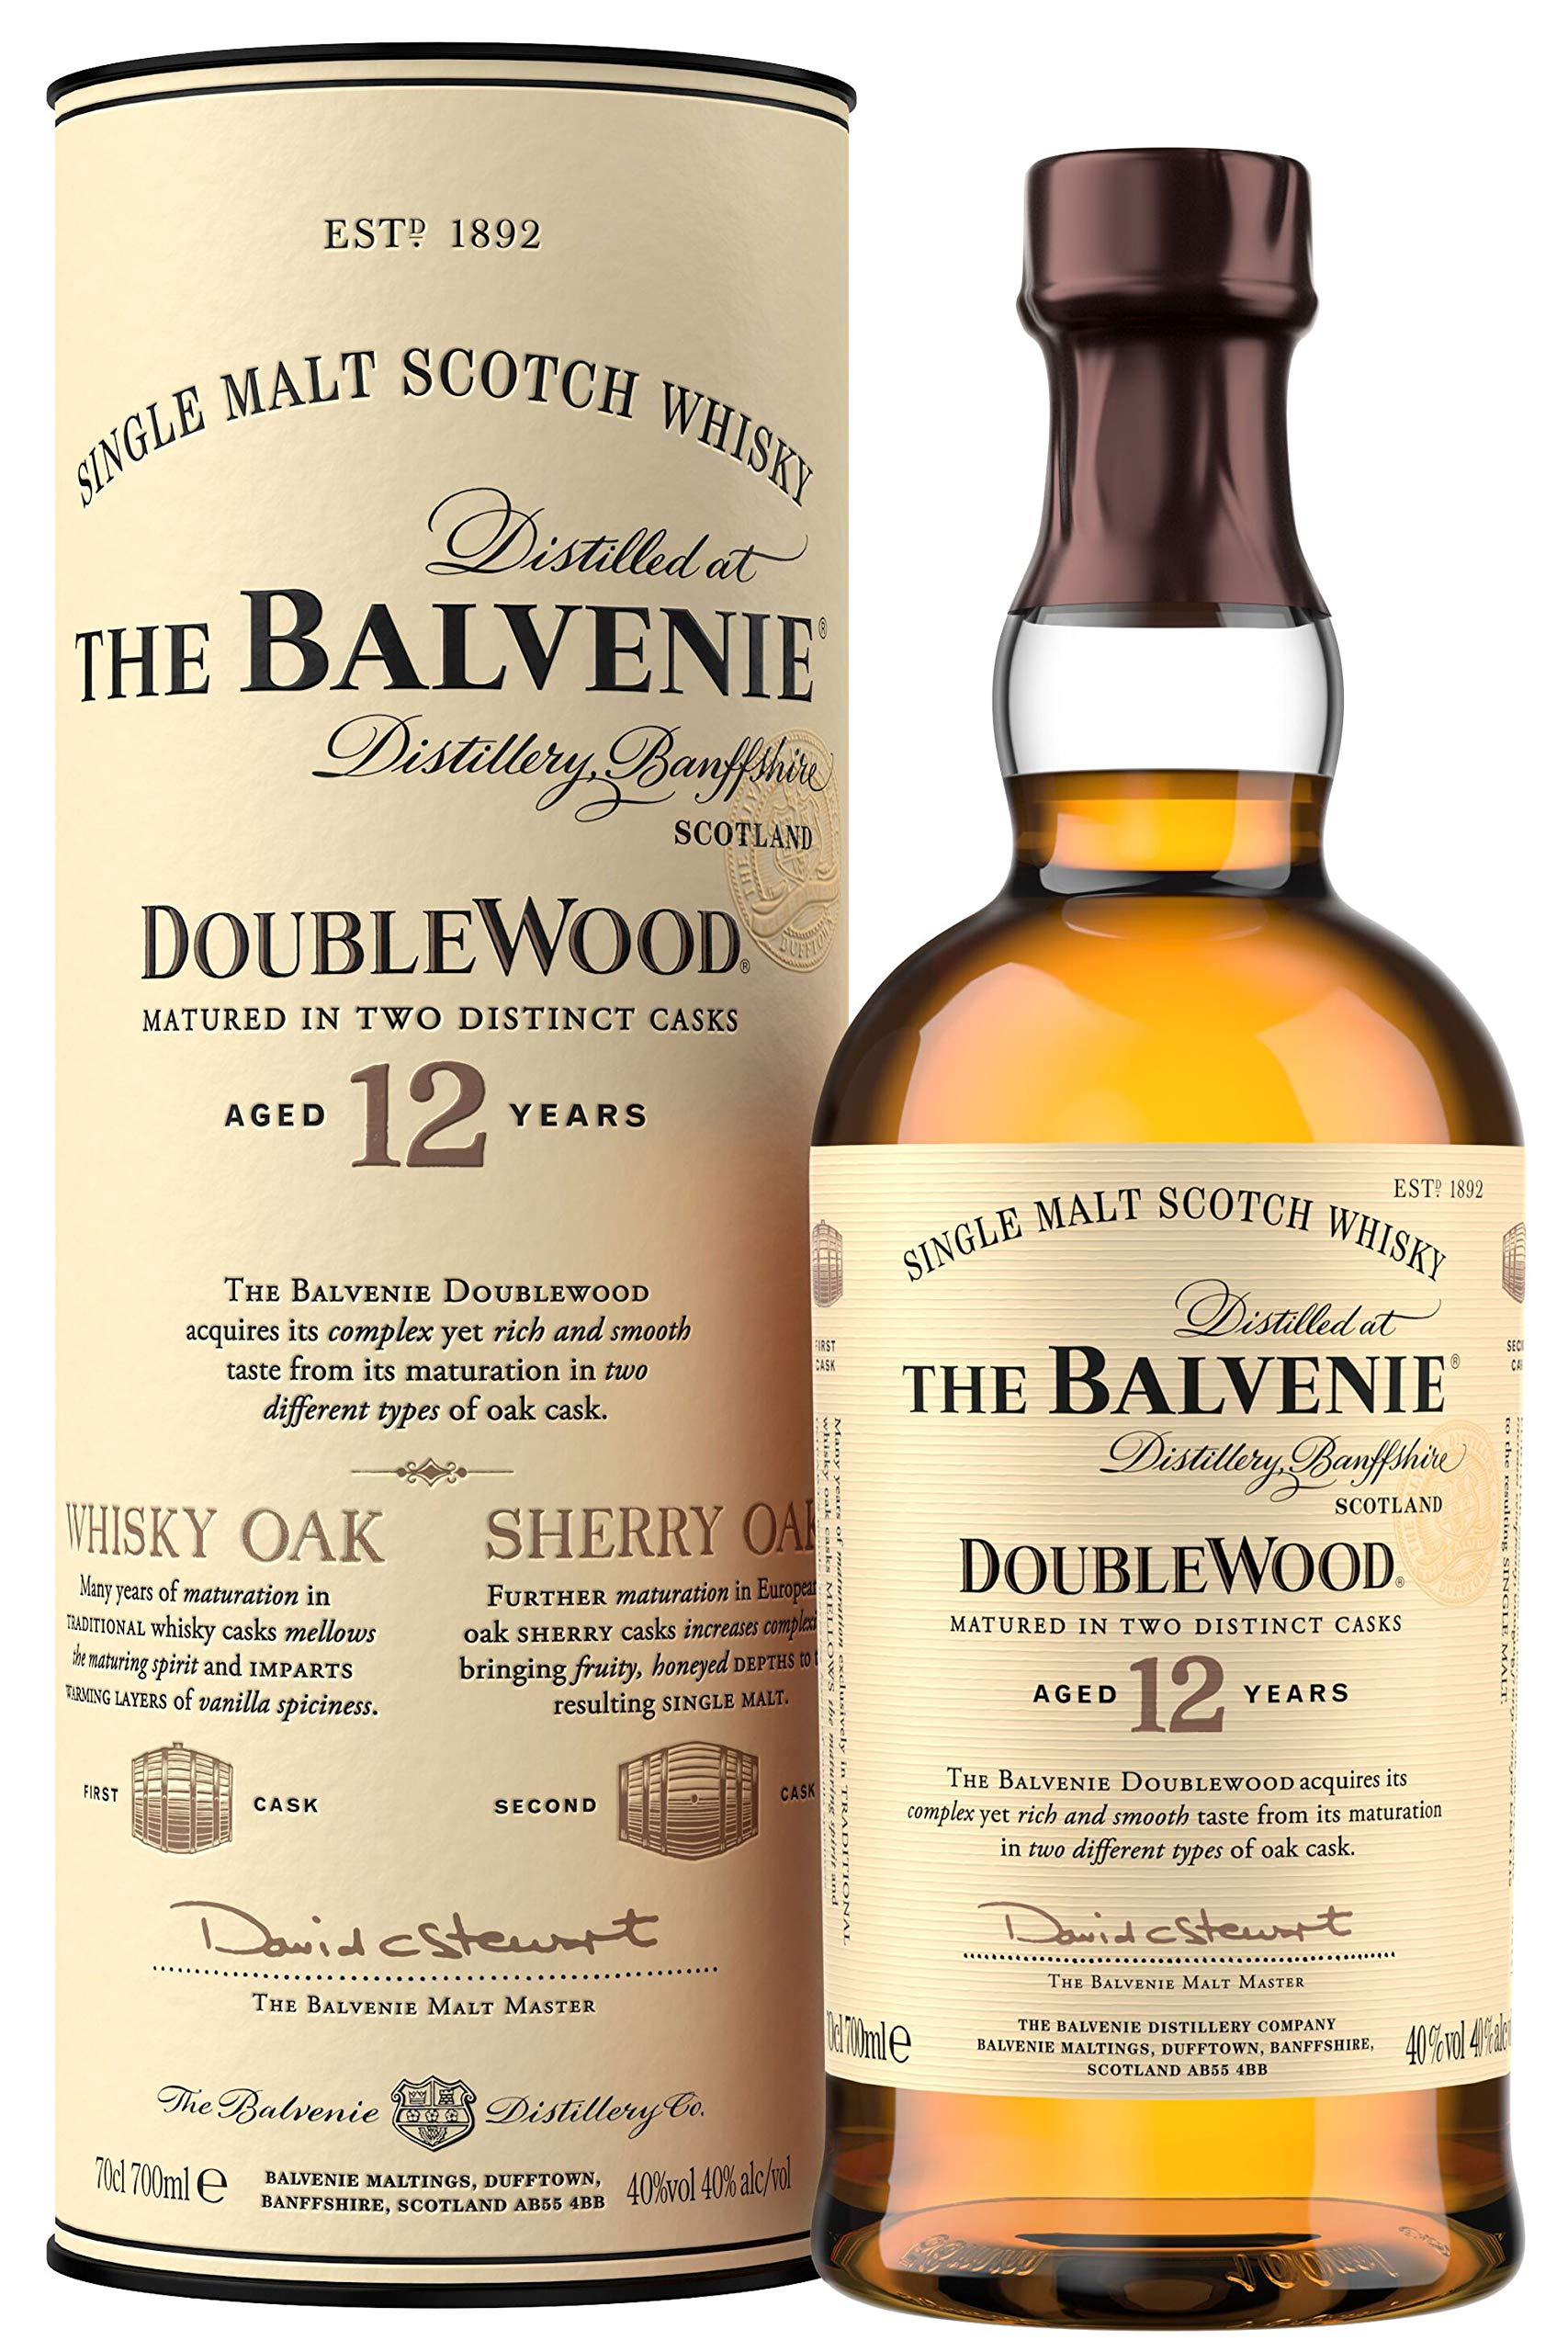 The Balvenie Double Wood 12 Year Old Single Malt Scotch Whisky 70 cl